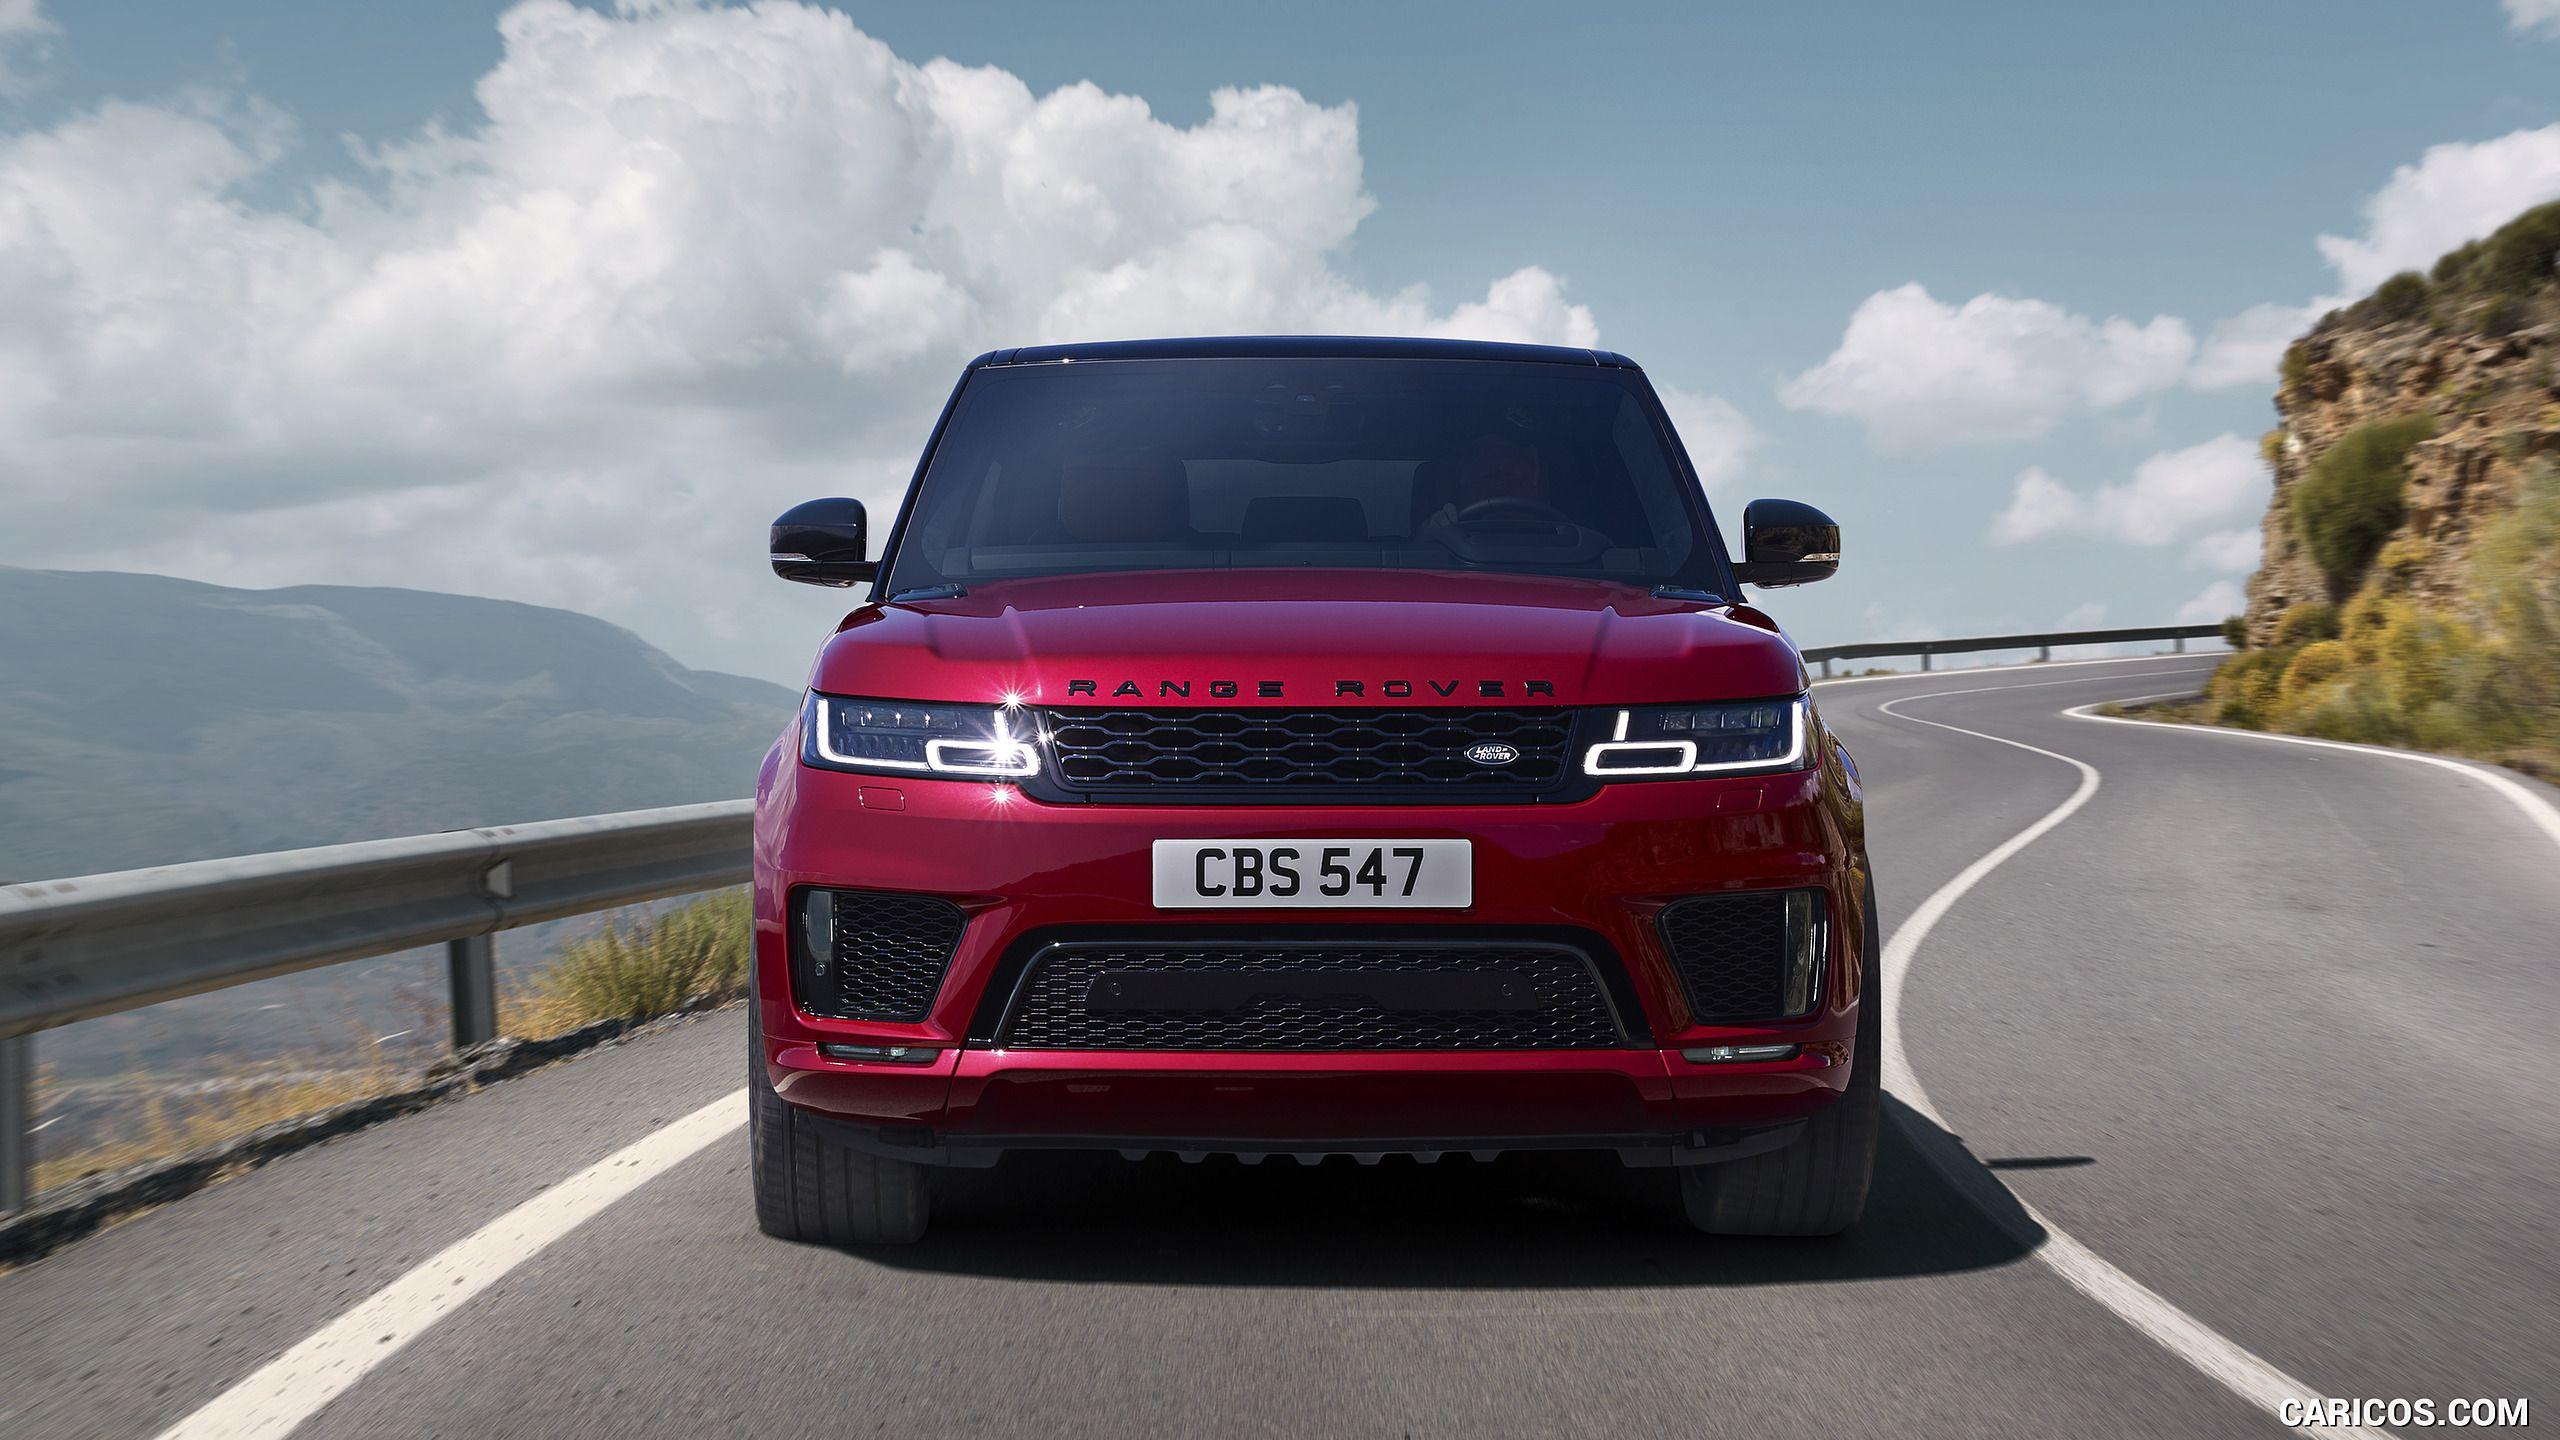 2018 Range Rover Sport Front Hd Land Rover Range Rover Sport Jaguar Land Rover